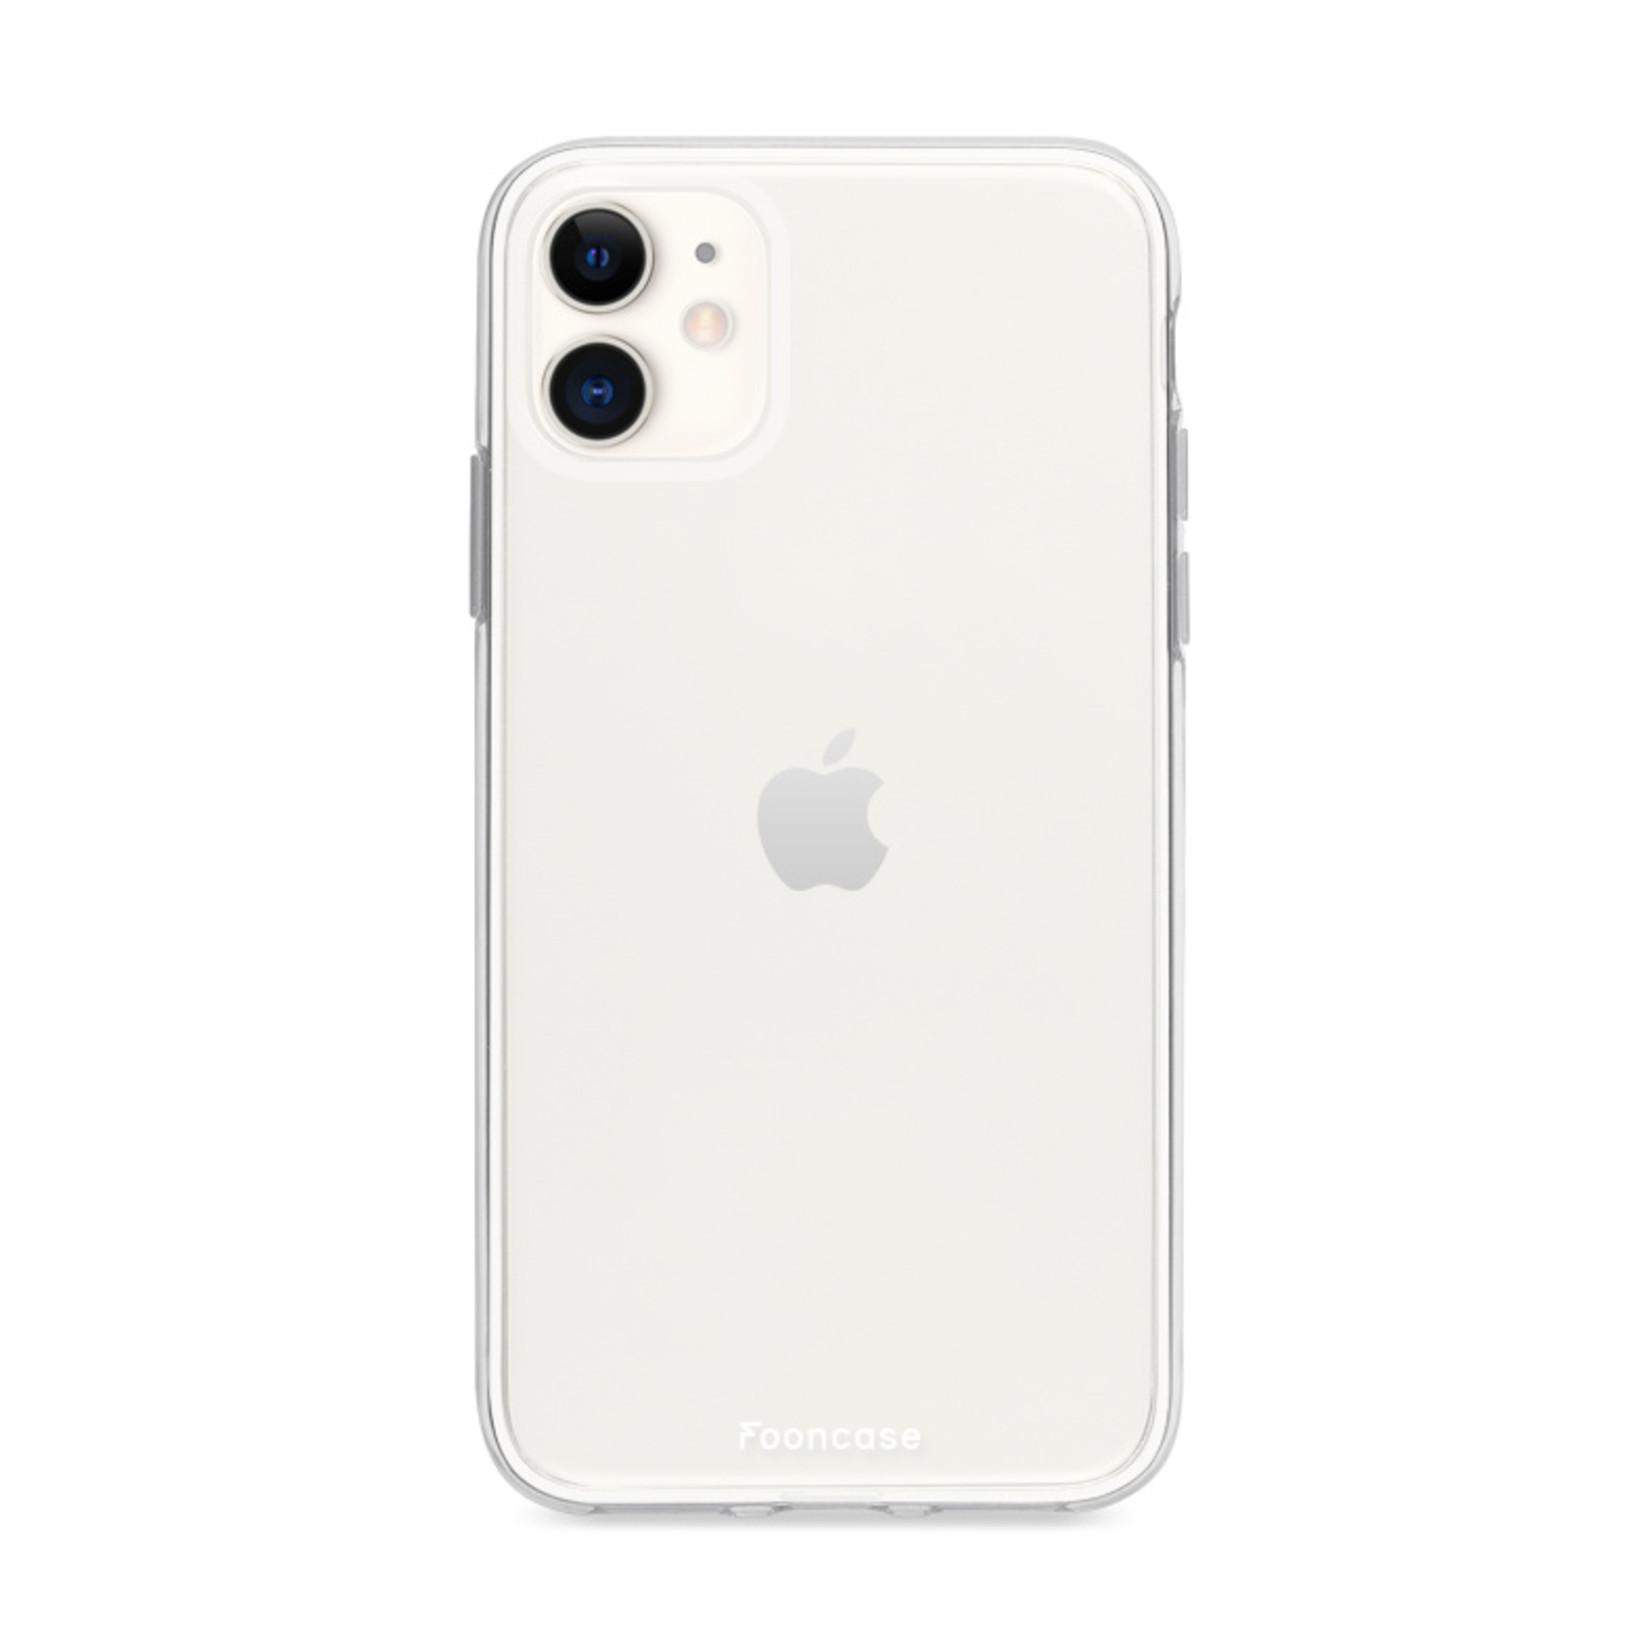 FOONCASE Iphone 11 Hülle - Transparant